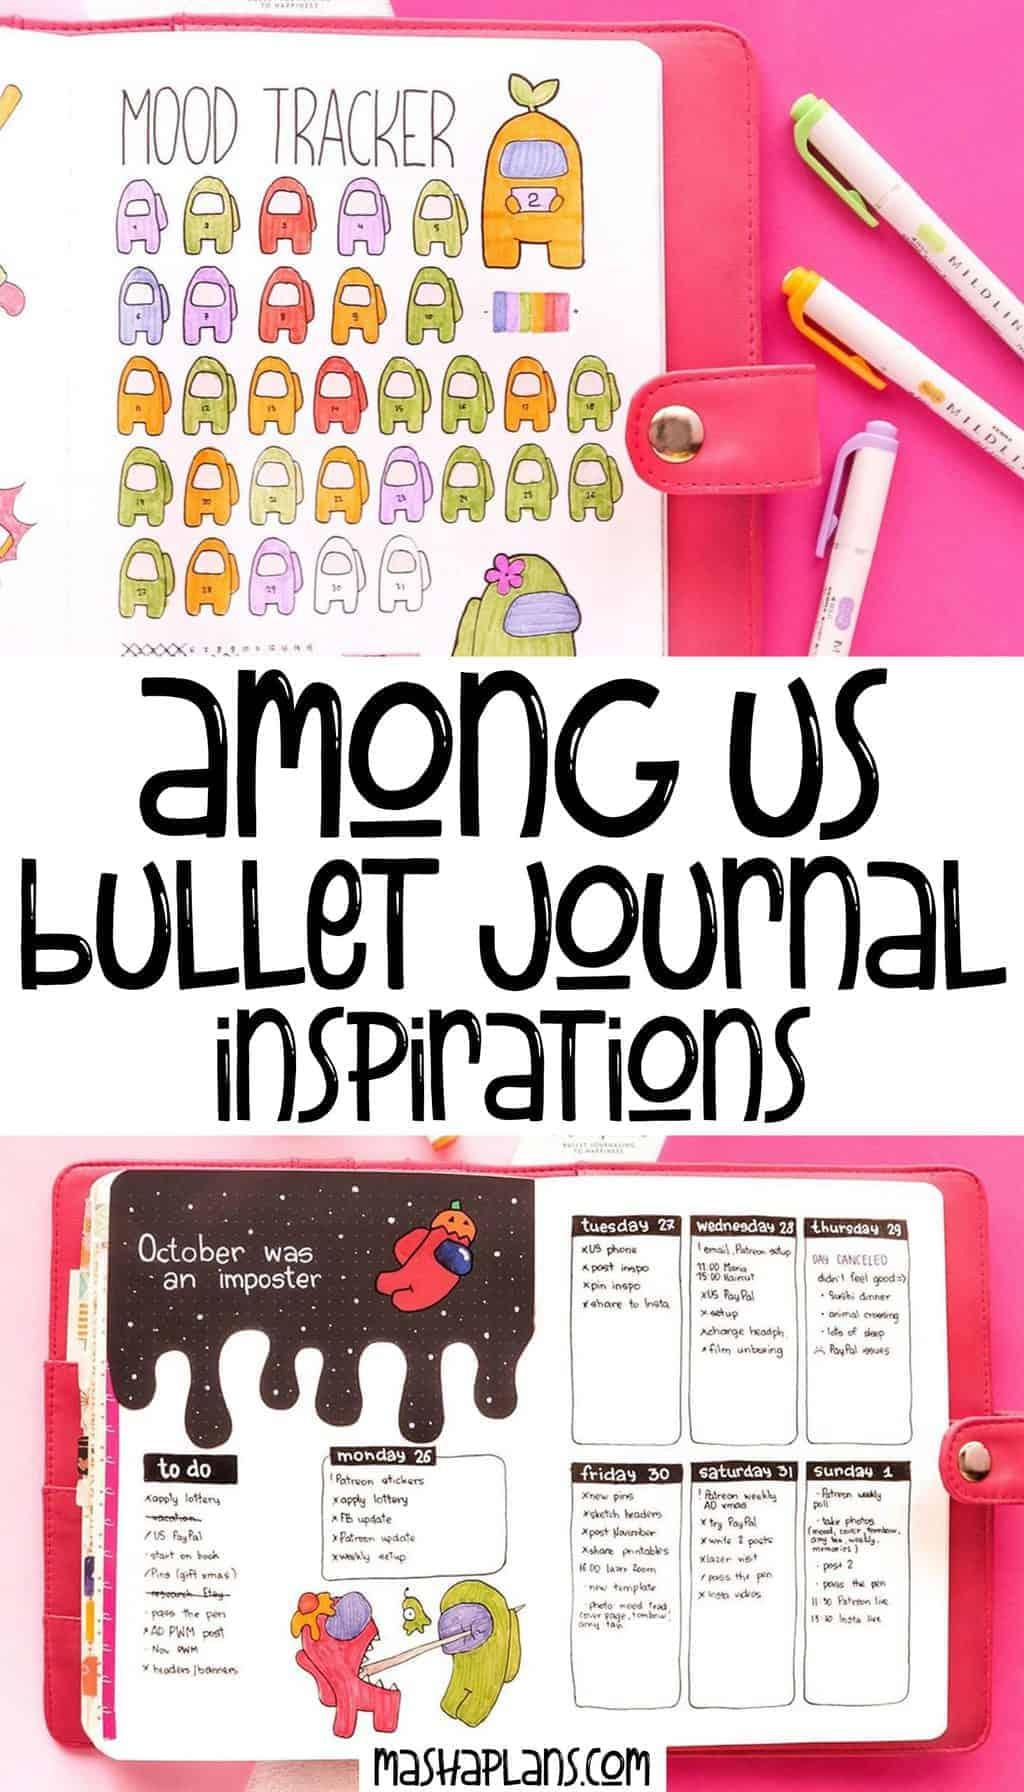 Among Us Themed Bullet Journal Inspirations | Masha Plans